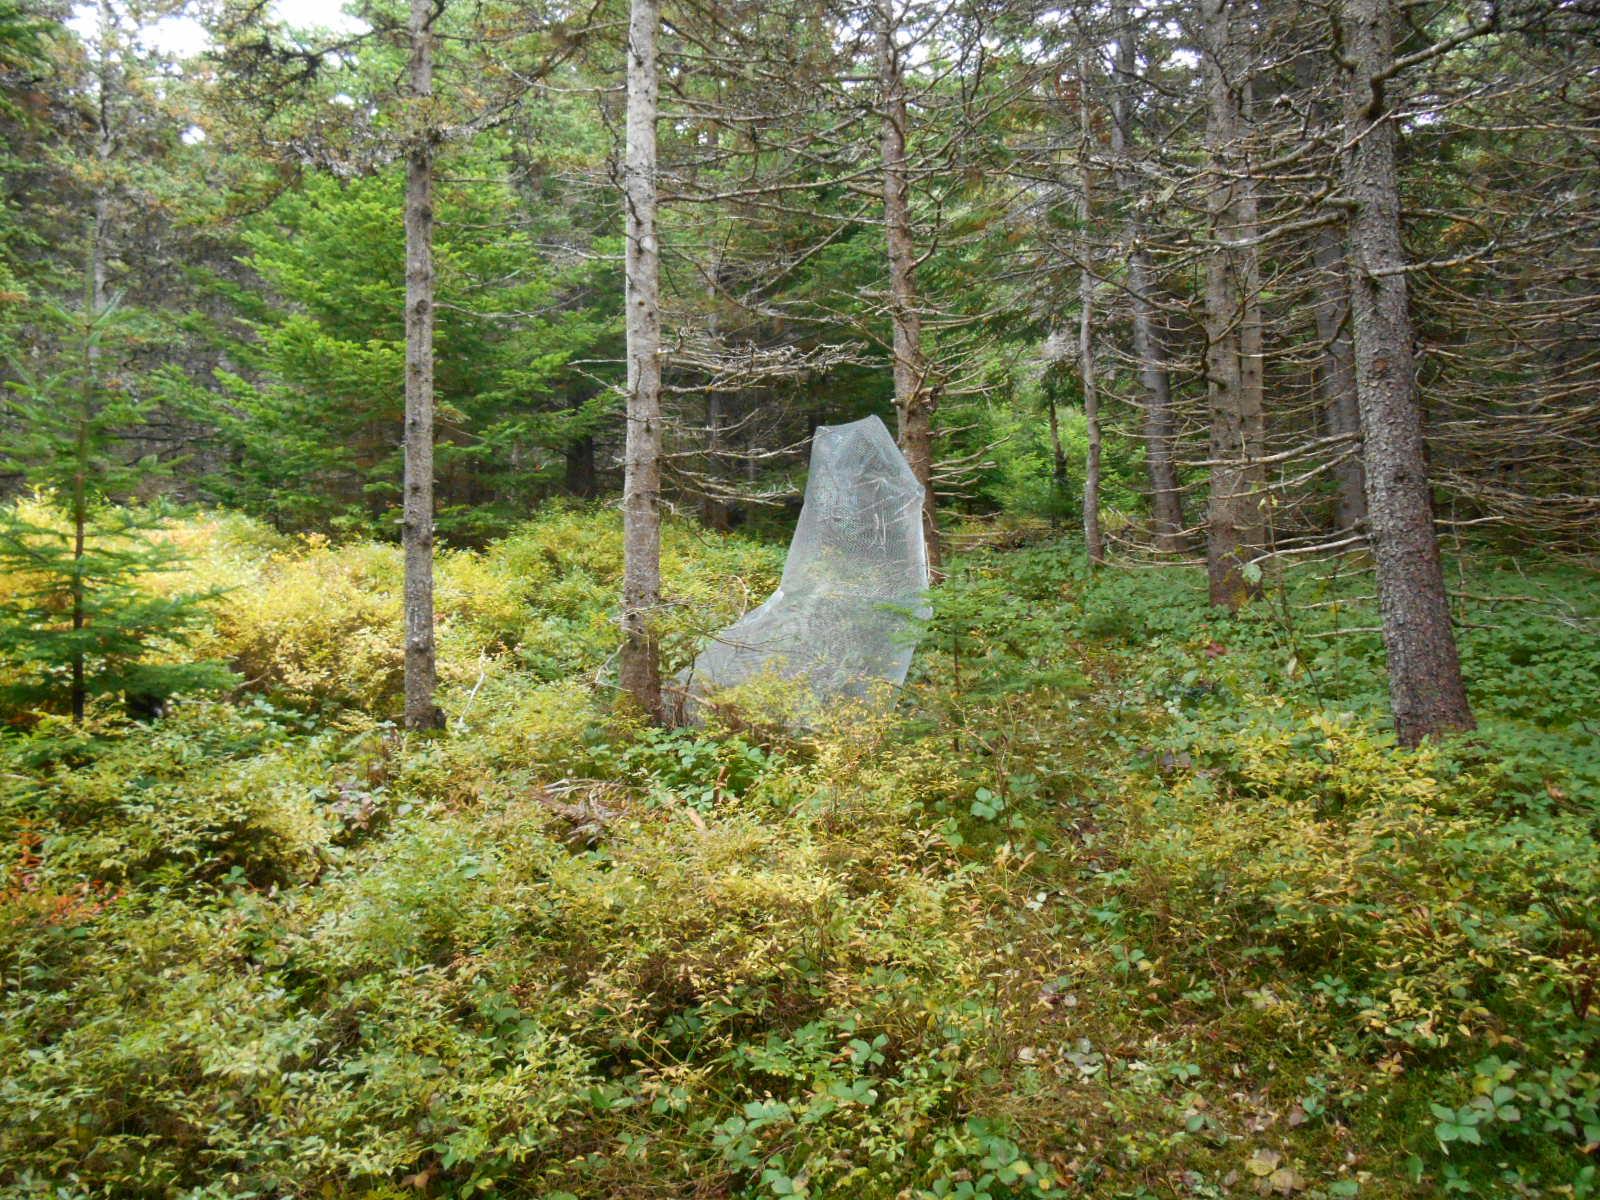 Spirito , metal mesh, 5 x 6 x 4 feet, 2013. Site Specific sculpture, East Coast Trail, St. Johns, Newfoundland, Canada, 2013.